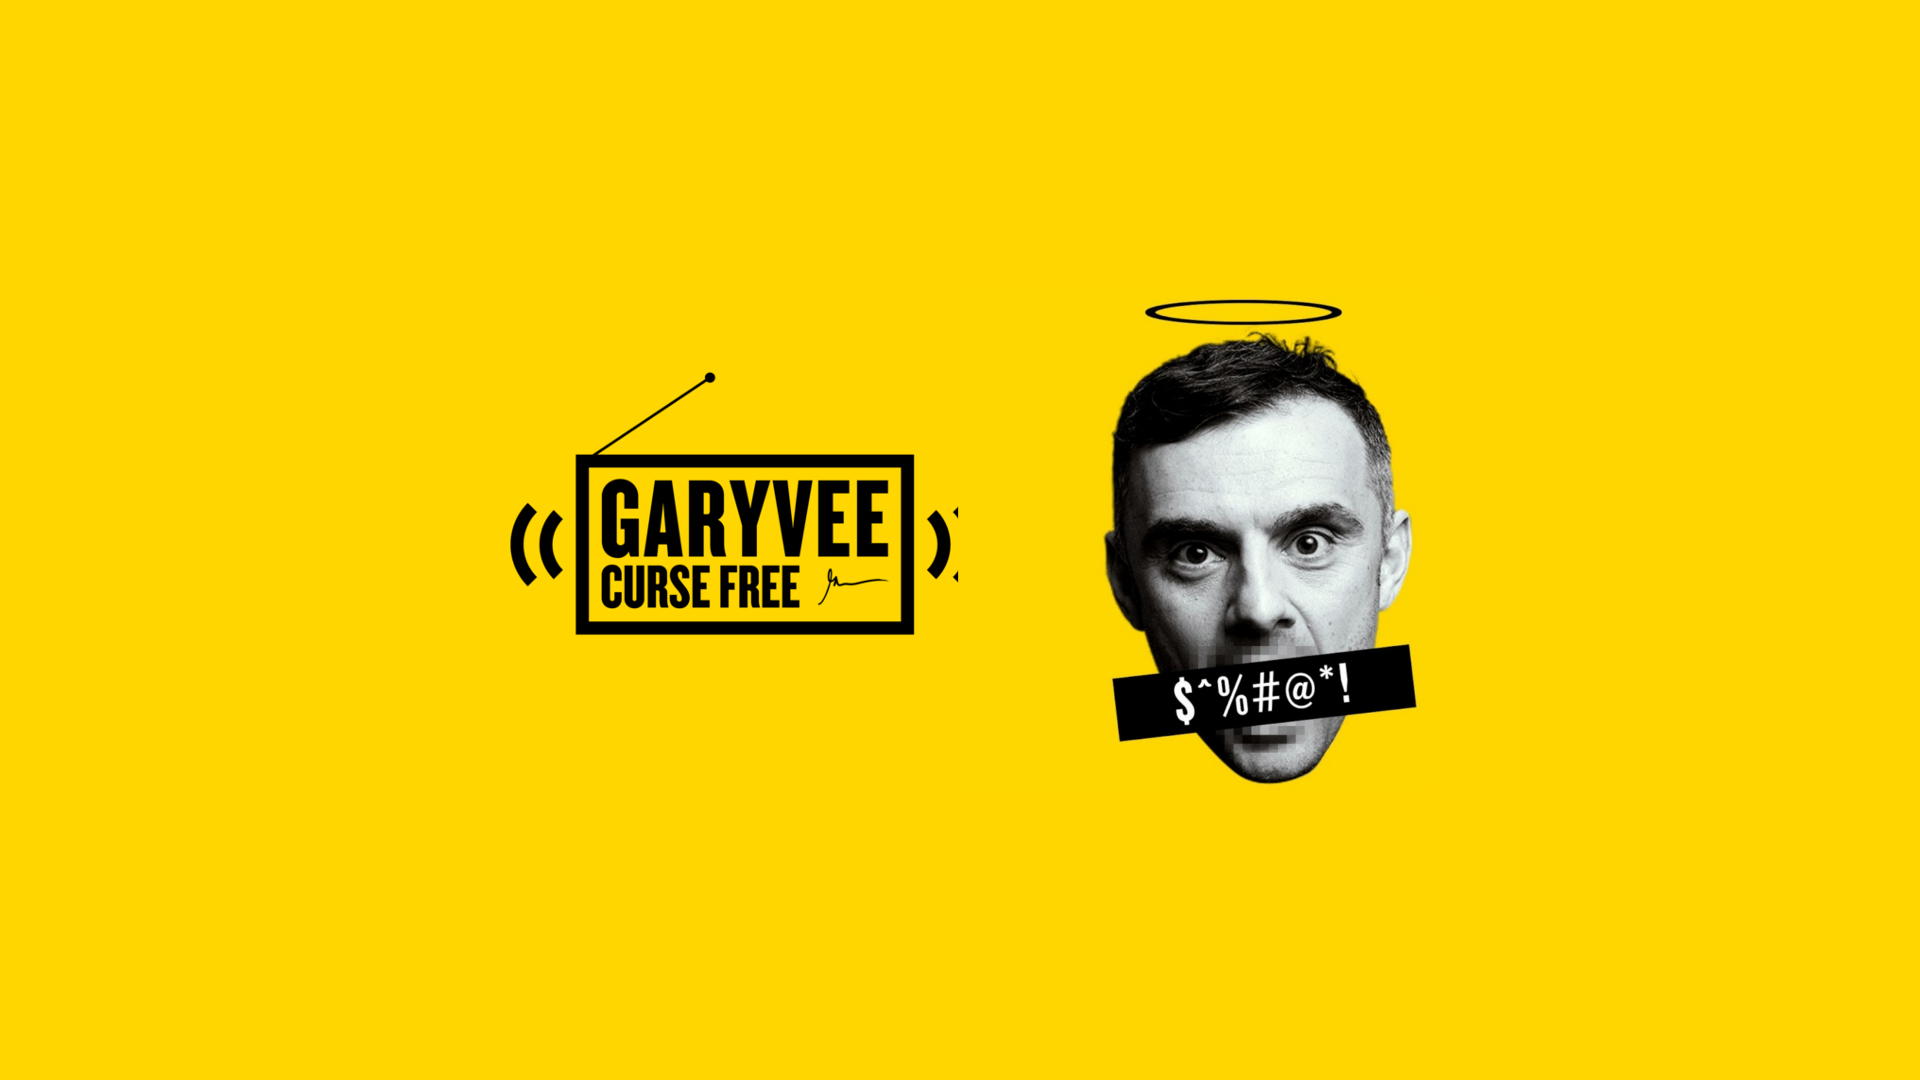 Curse Free GaryVee - Curse Free Content By GaryVee - Jay Woodford Dot Com Social Meta